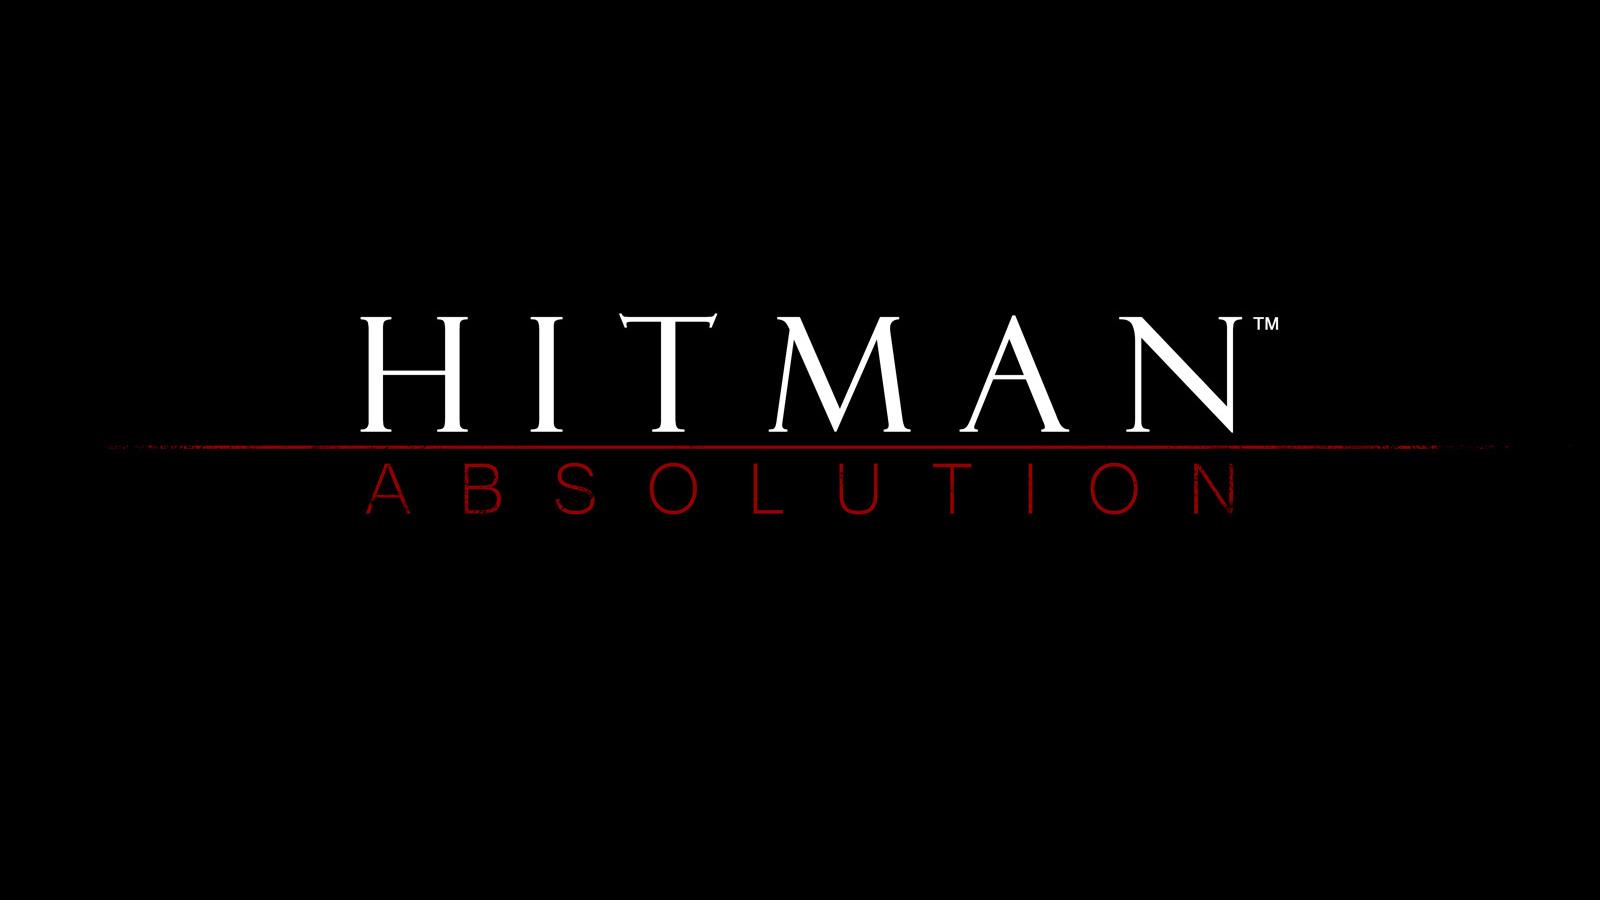 Hitman Absolution Logo hitman logo - forum | ...